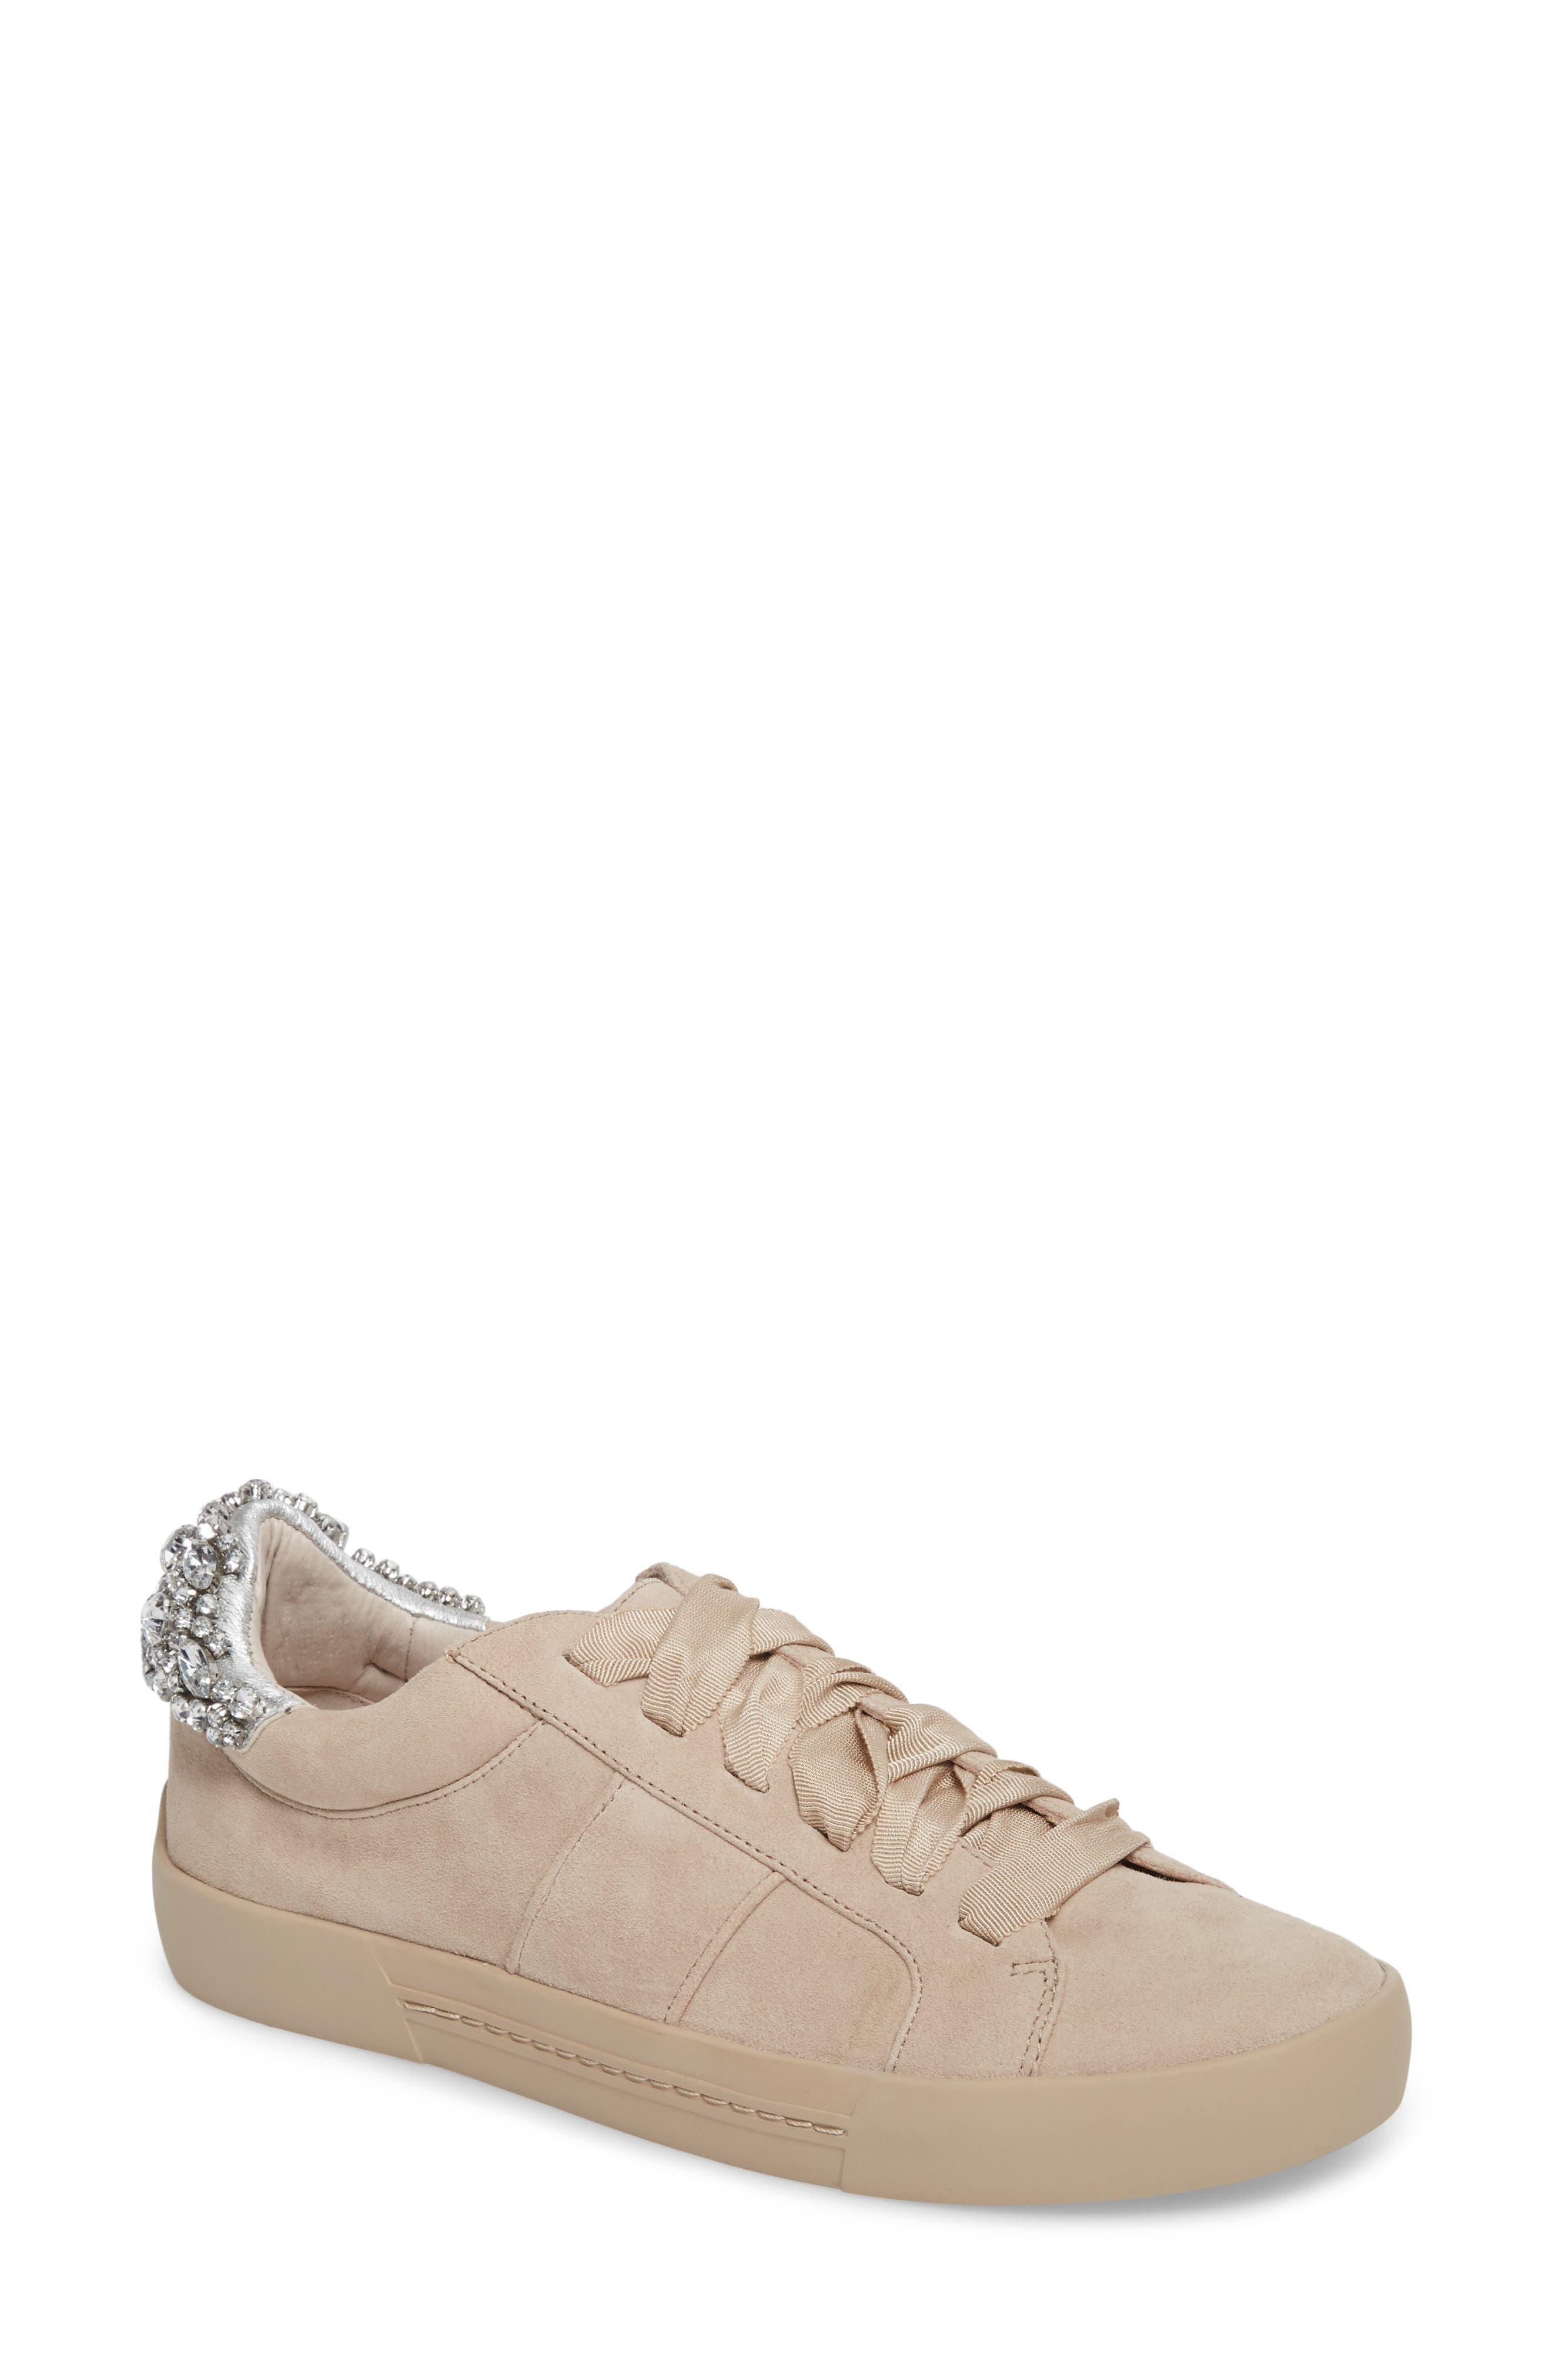 Darena Crystal Embellished Sneaker,                             Main thumbnail 1, color,                             Fog